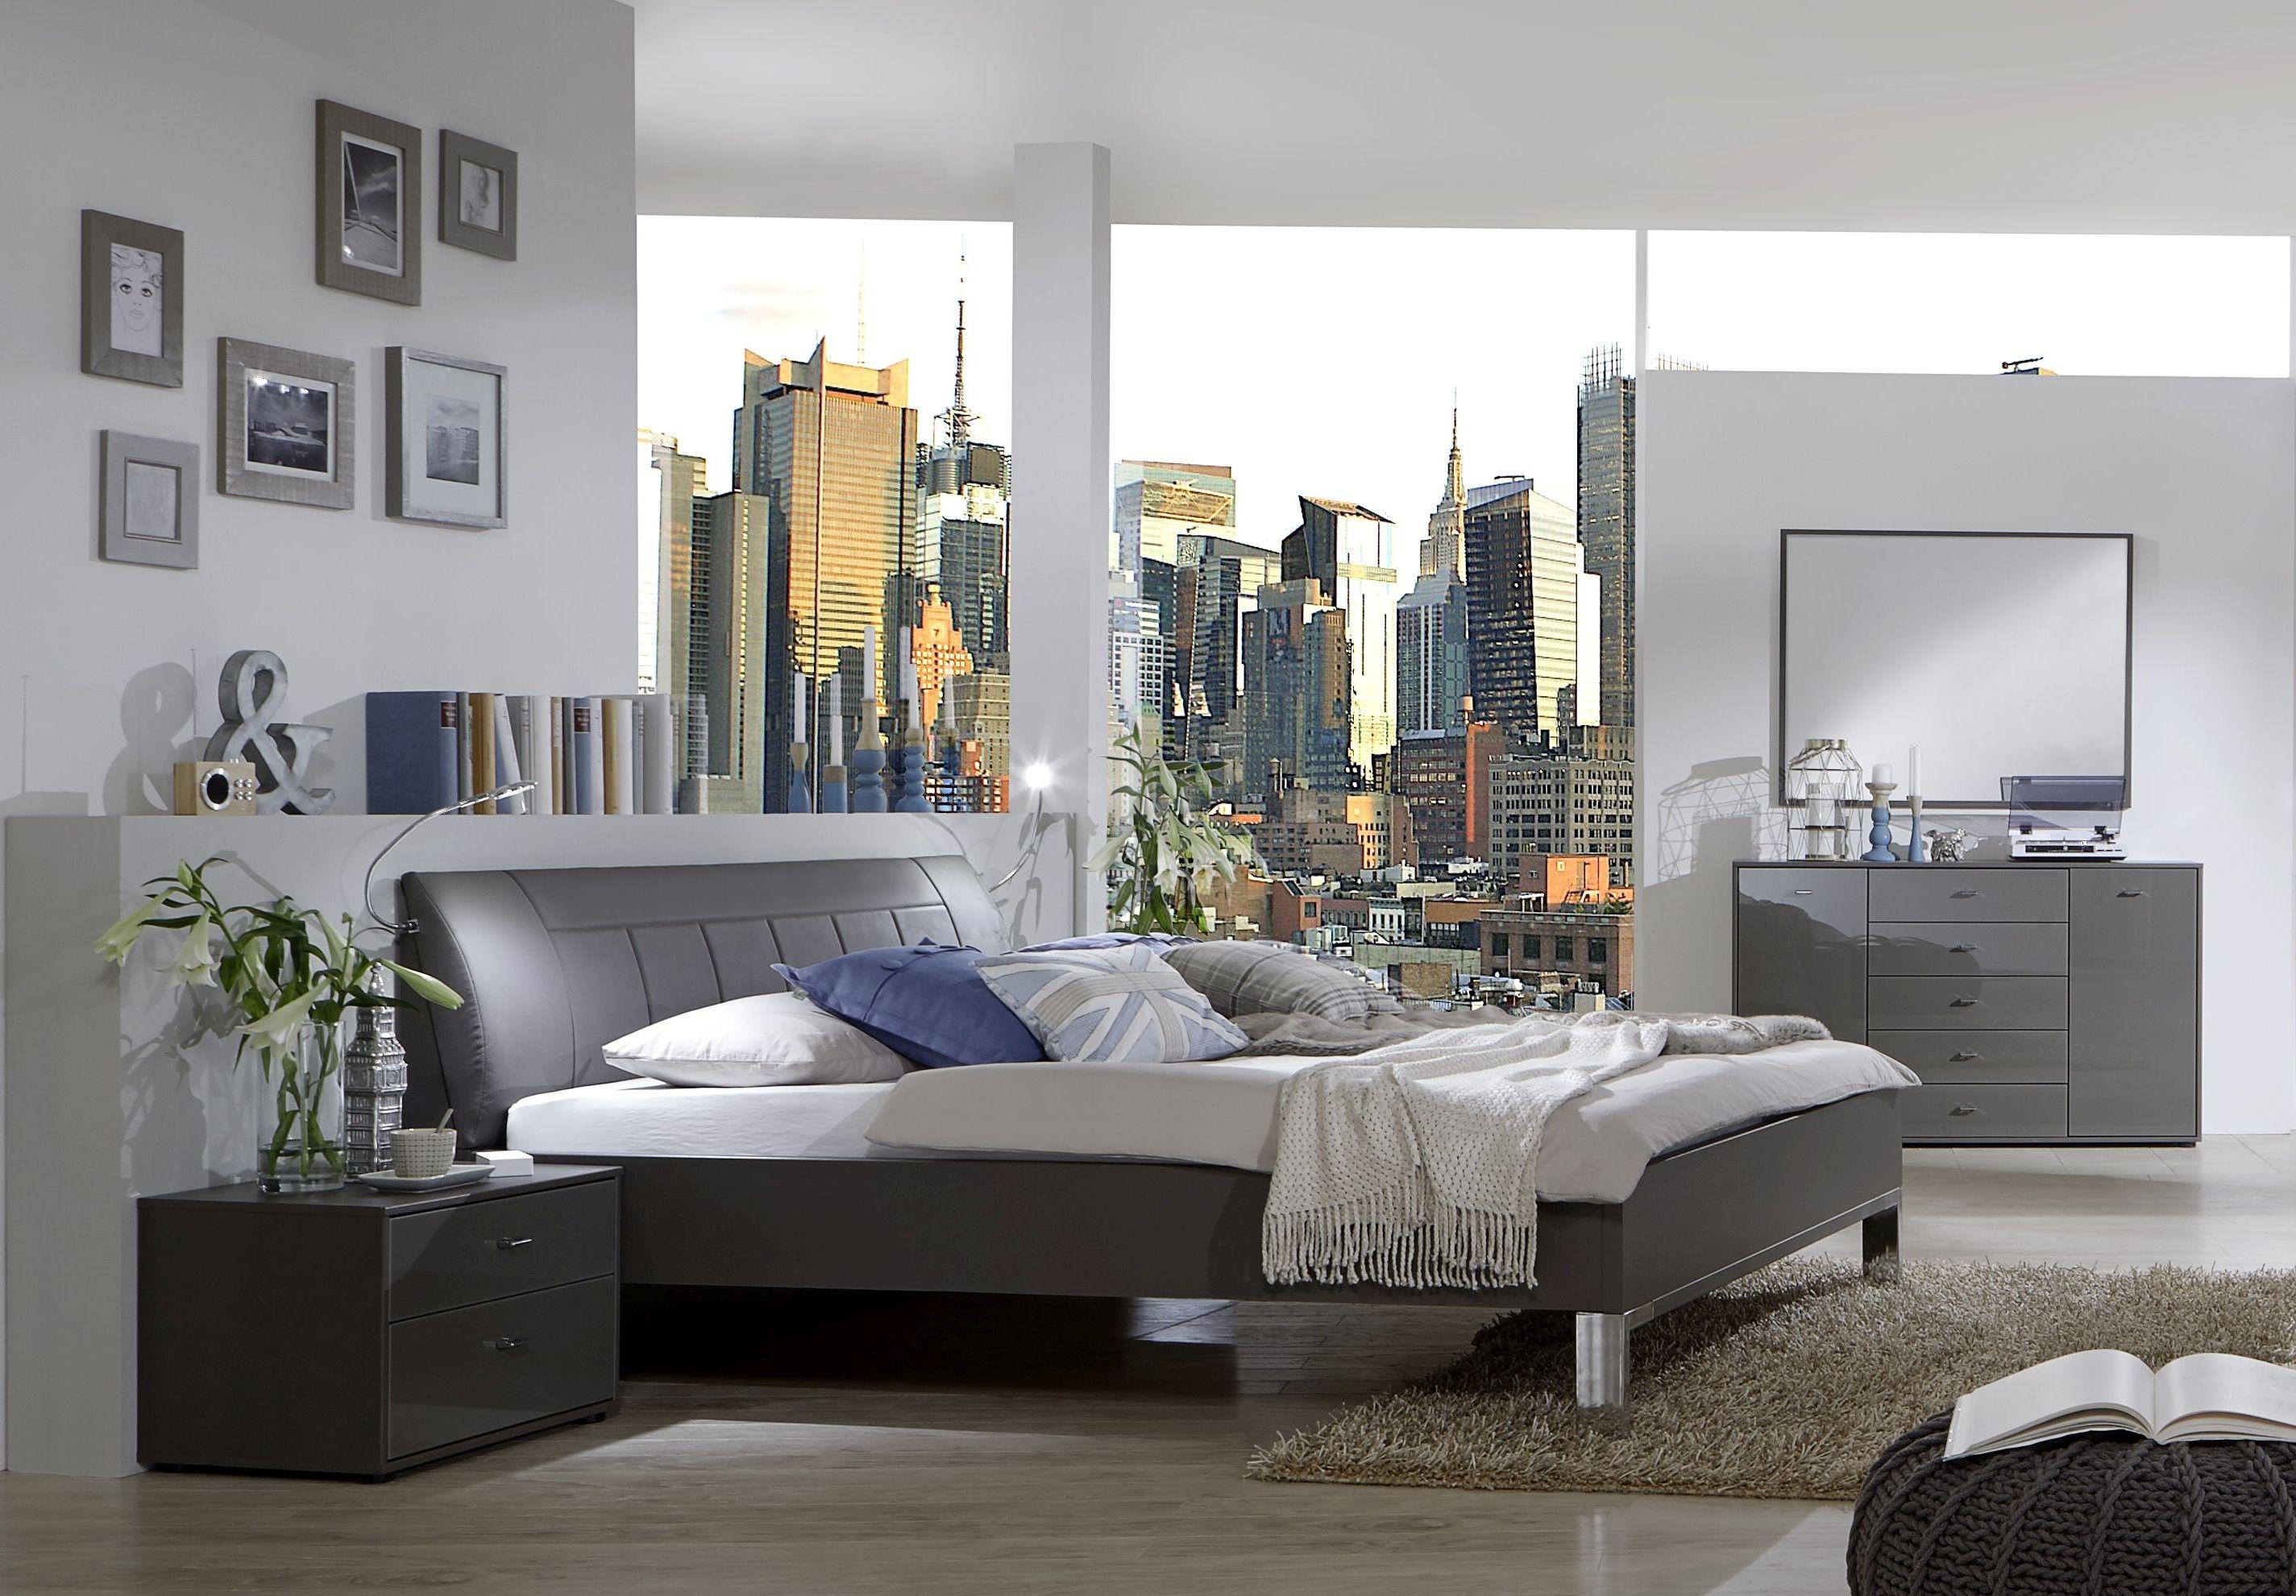 Wiemann VIP Eastside 6ft Queen Size Leather 48cm Footboard Height Bed in Havana - 180cm x 200cm